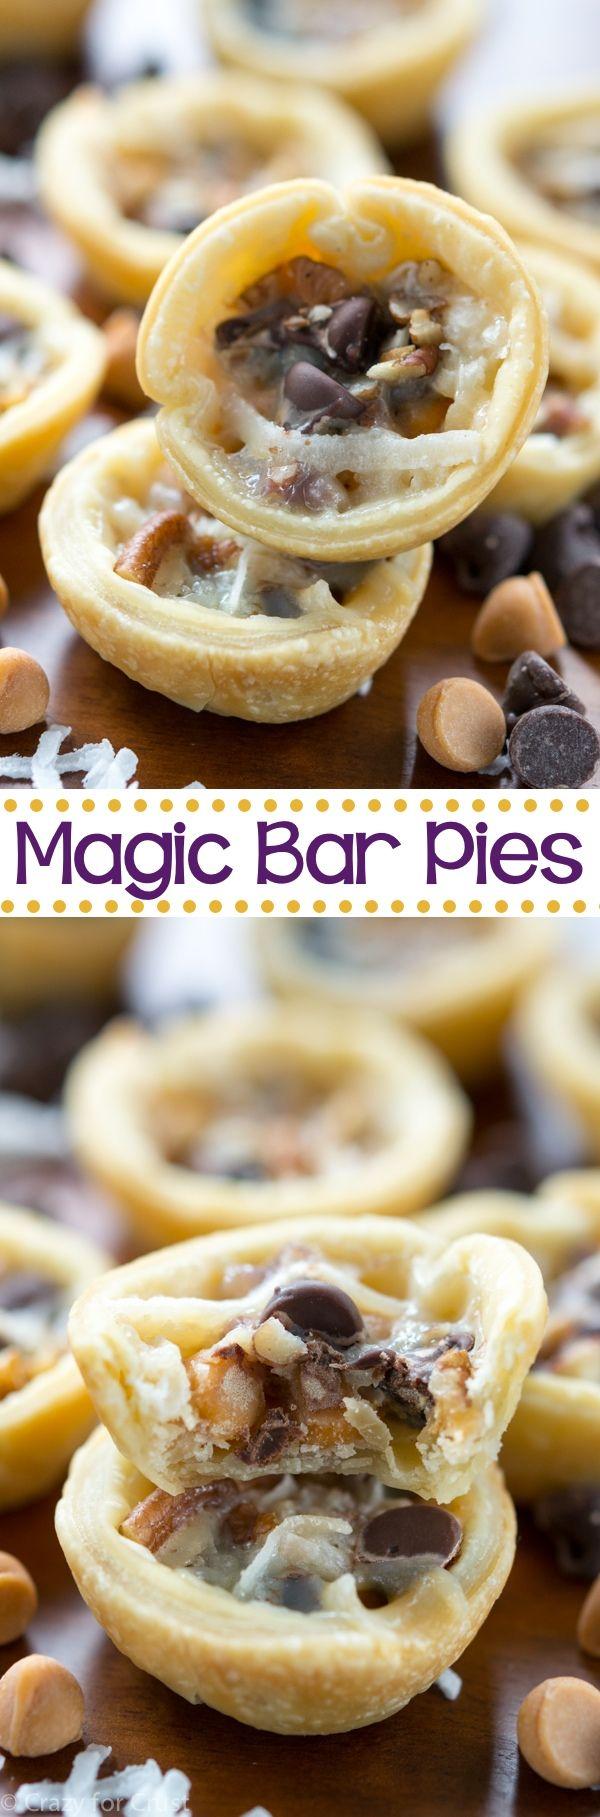 Mini Magic Bar Pies